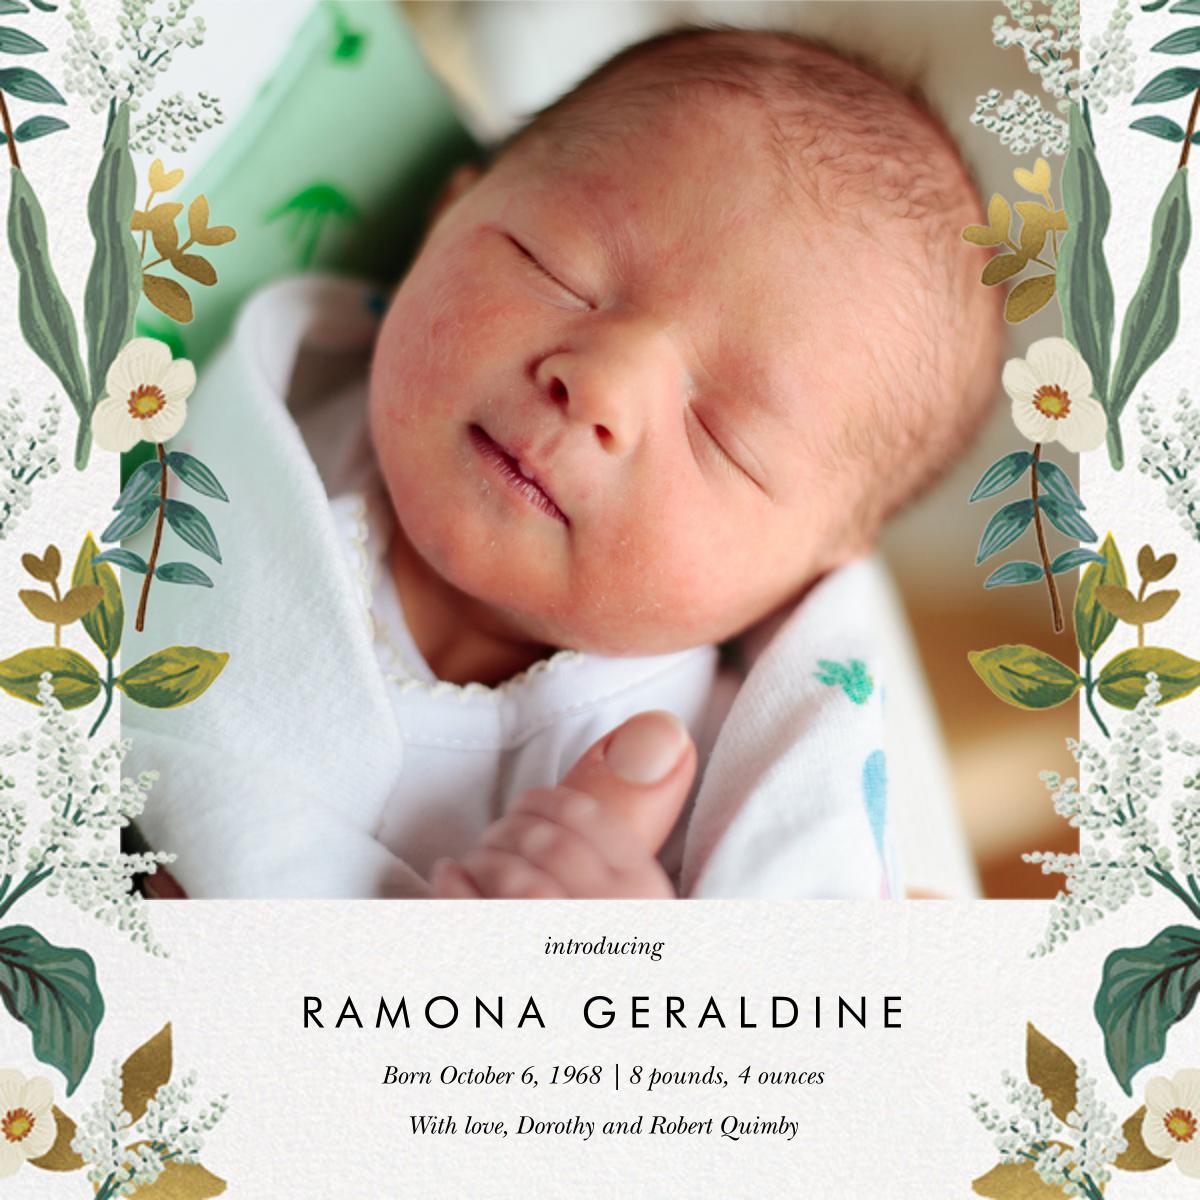 Meadow Garland Photo - Rifle Paper Co. - Birth